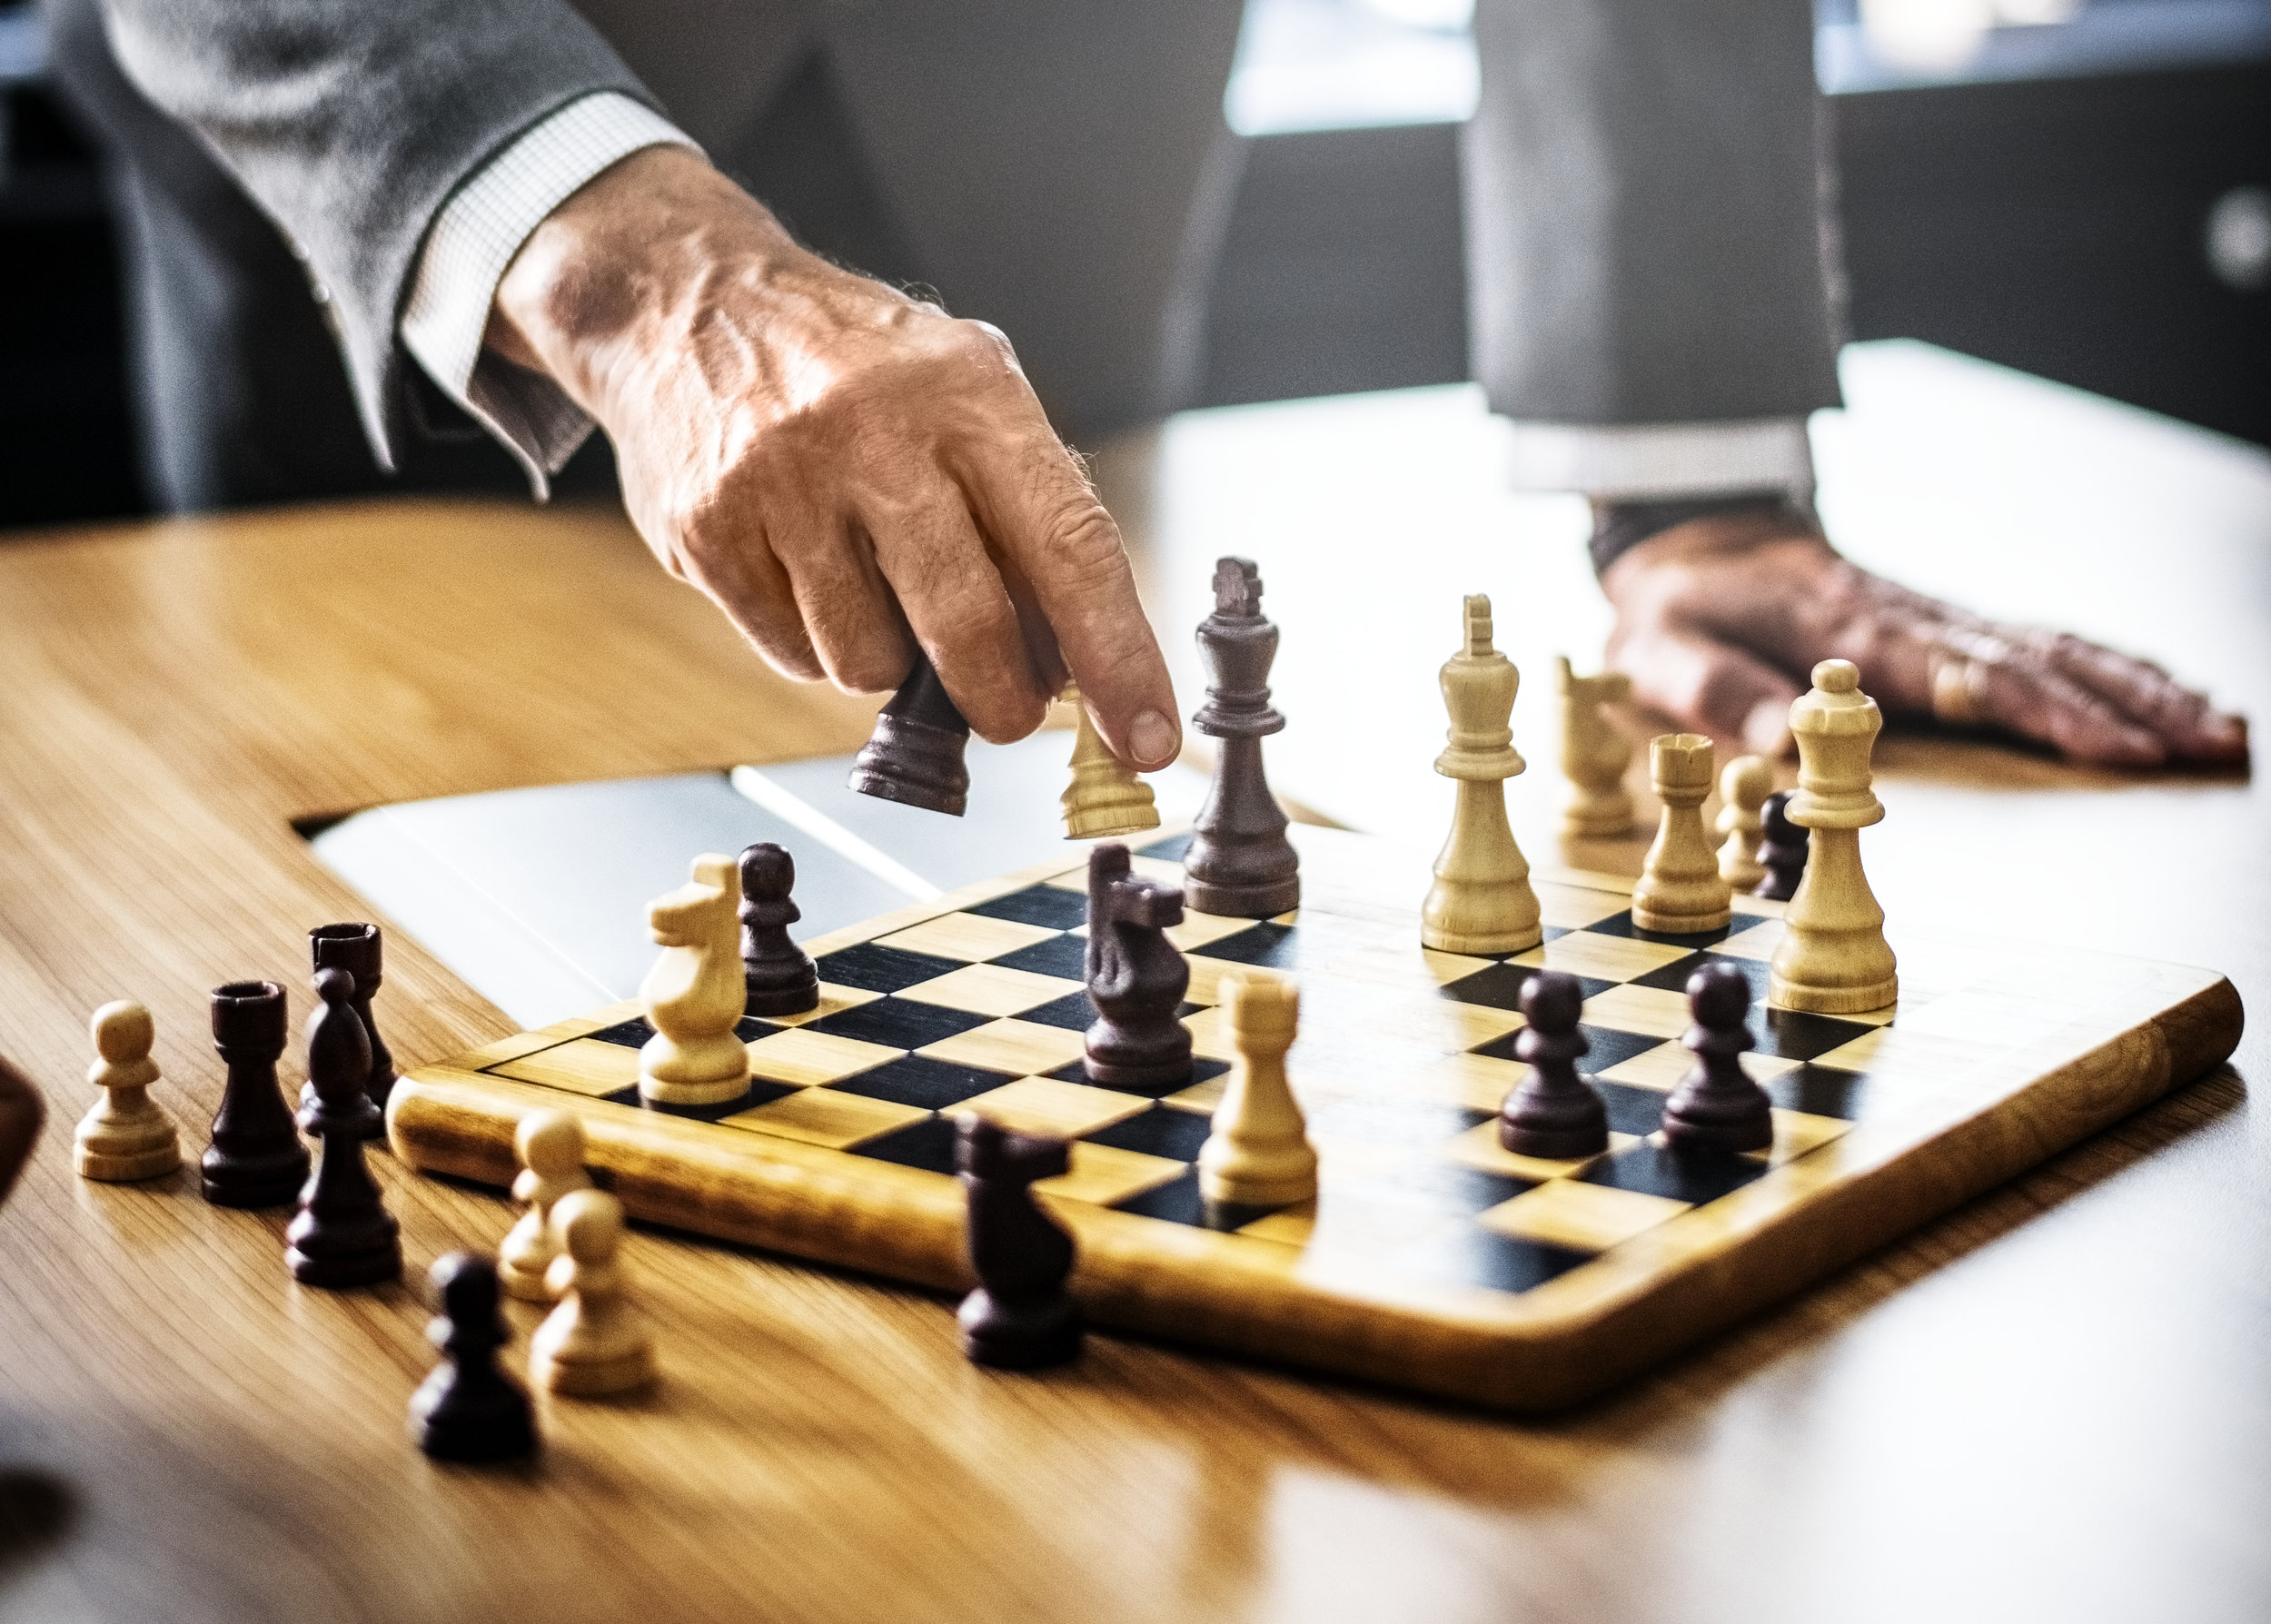 achievement-adult-battle-black-board-business-1432573-pxhere.com.jpg